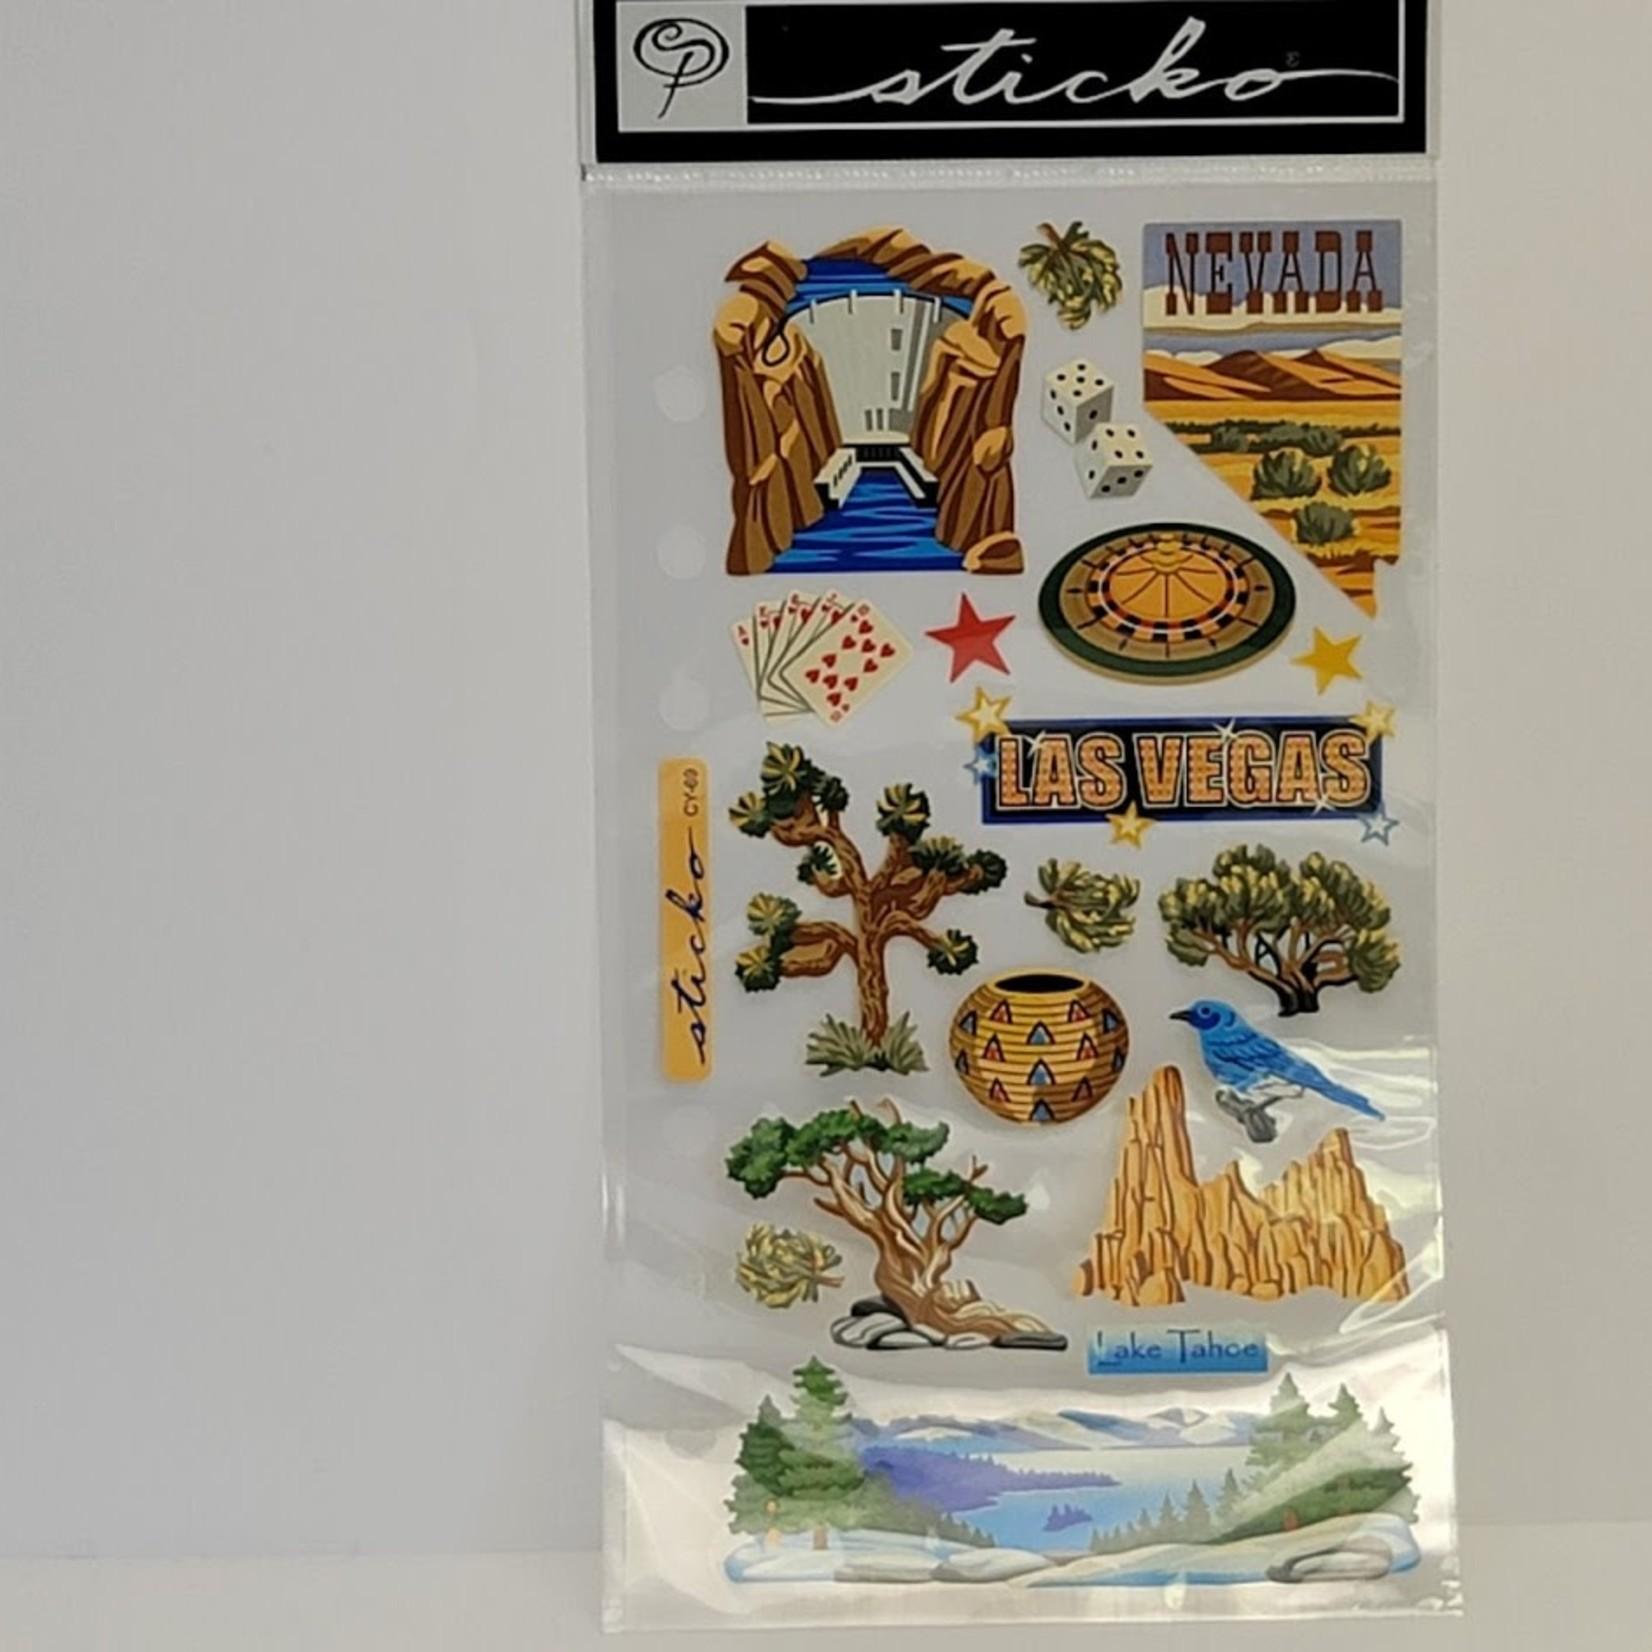 Sticko - Stickers - Las Vegas